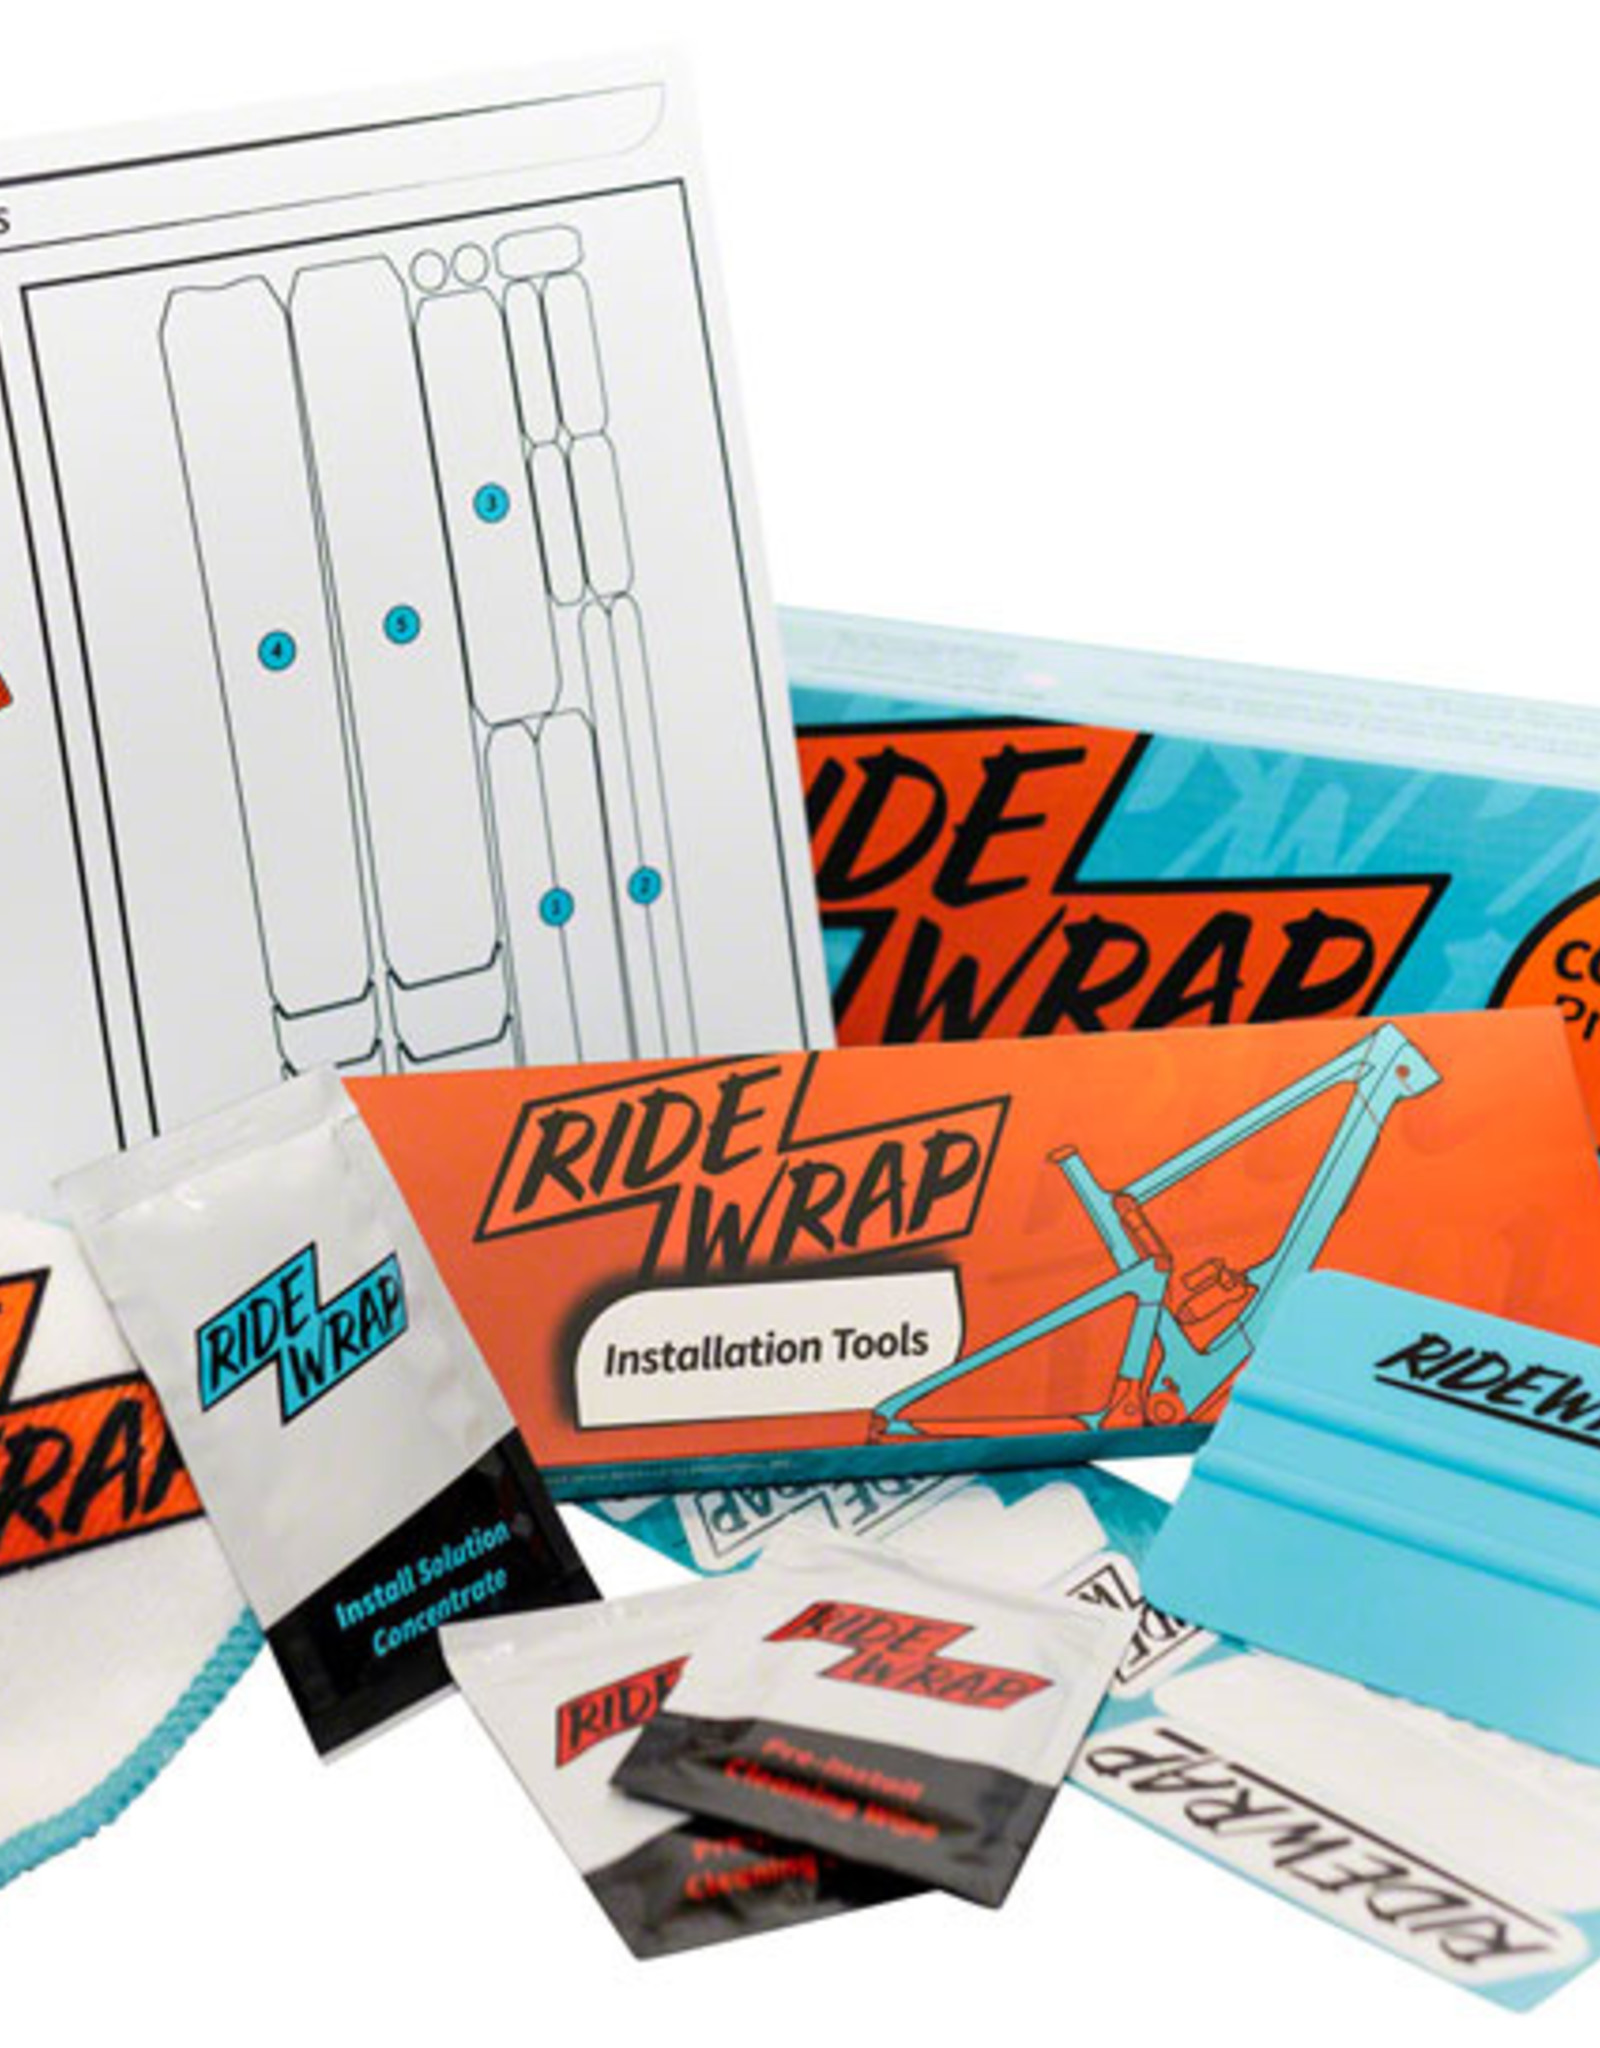 Ride Wrap RideWrap Covered Frame Kit